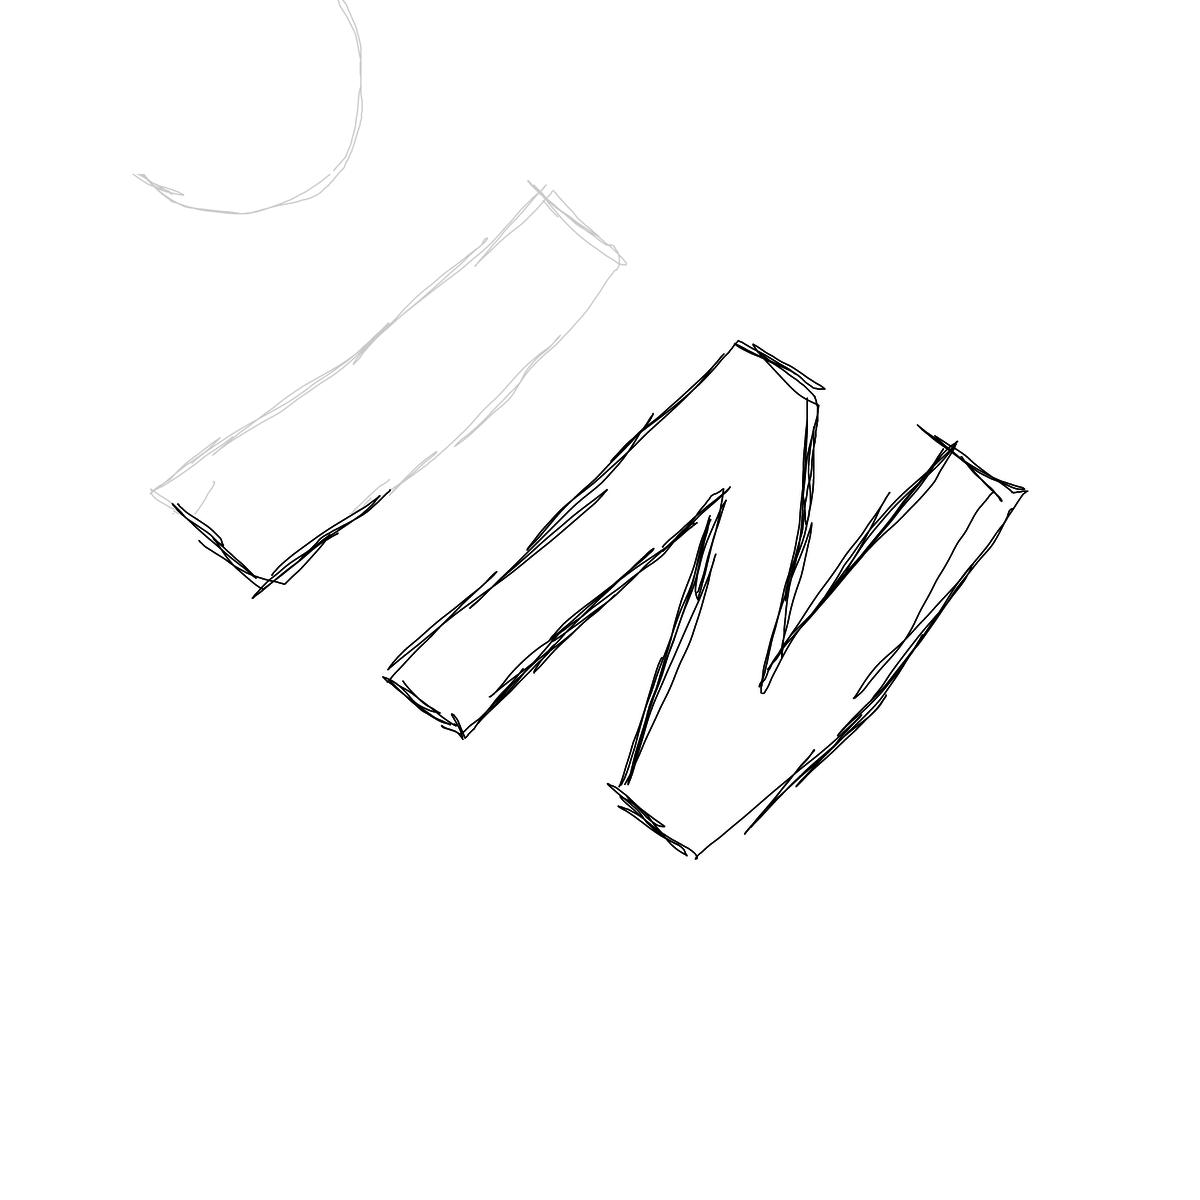 BAAAM drawing#18259 lat:-23.5658226013183600lng: -46.6512794494628900